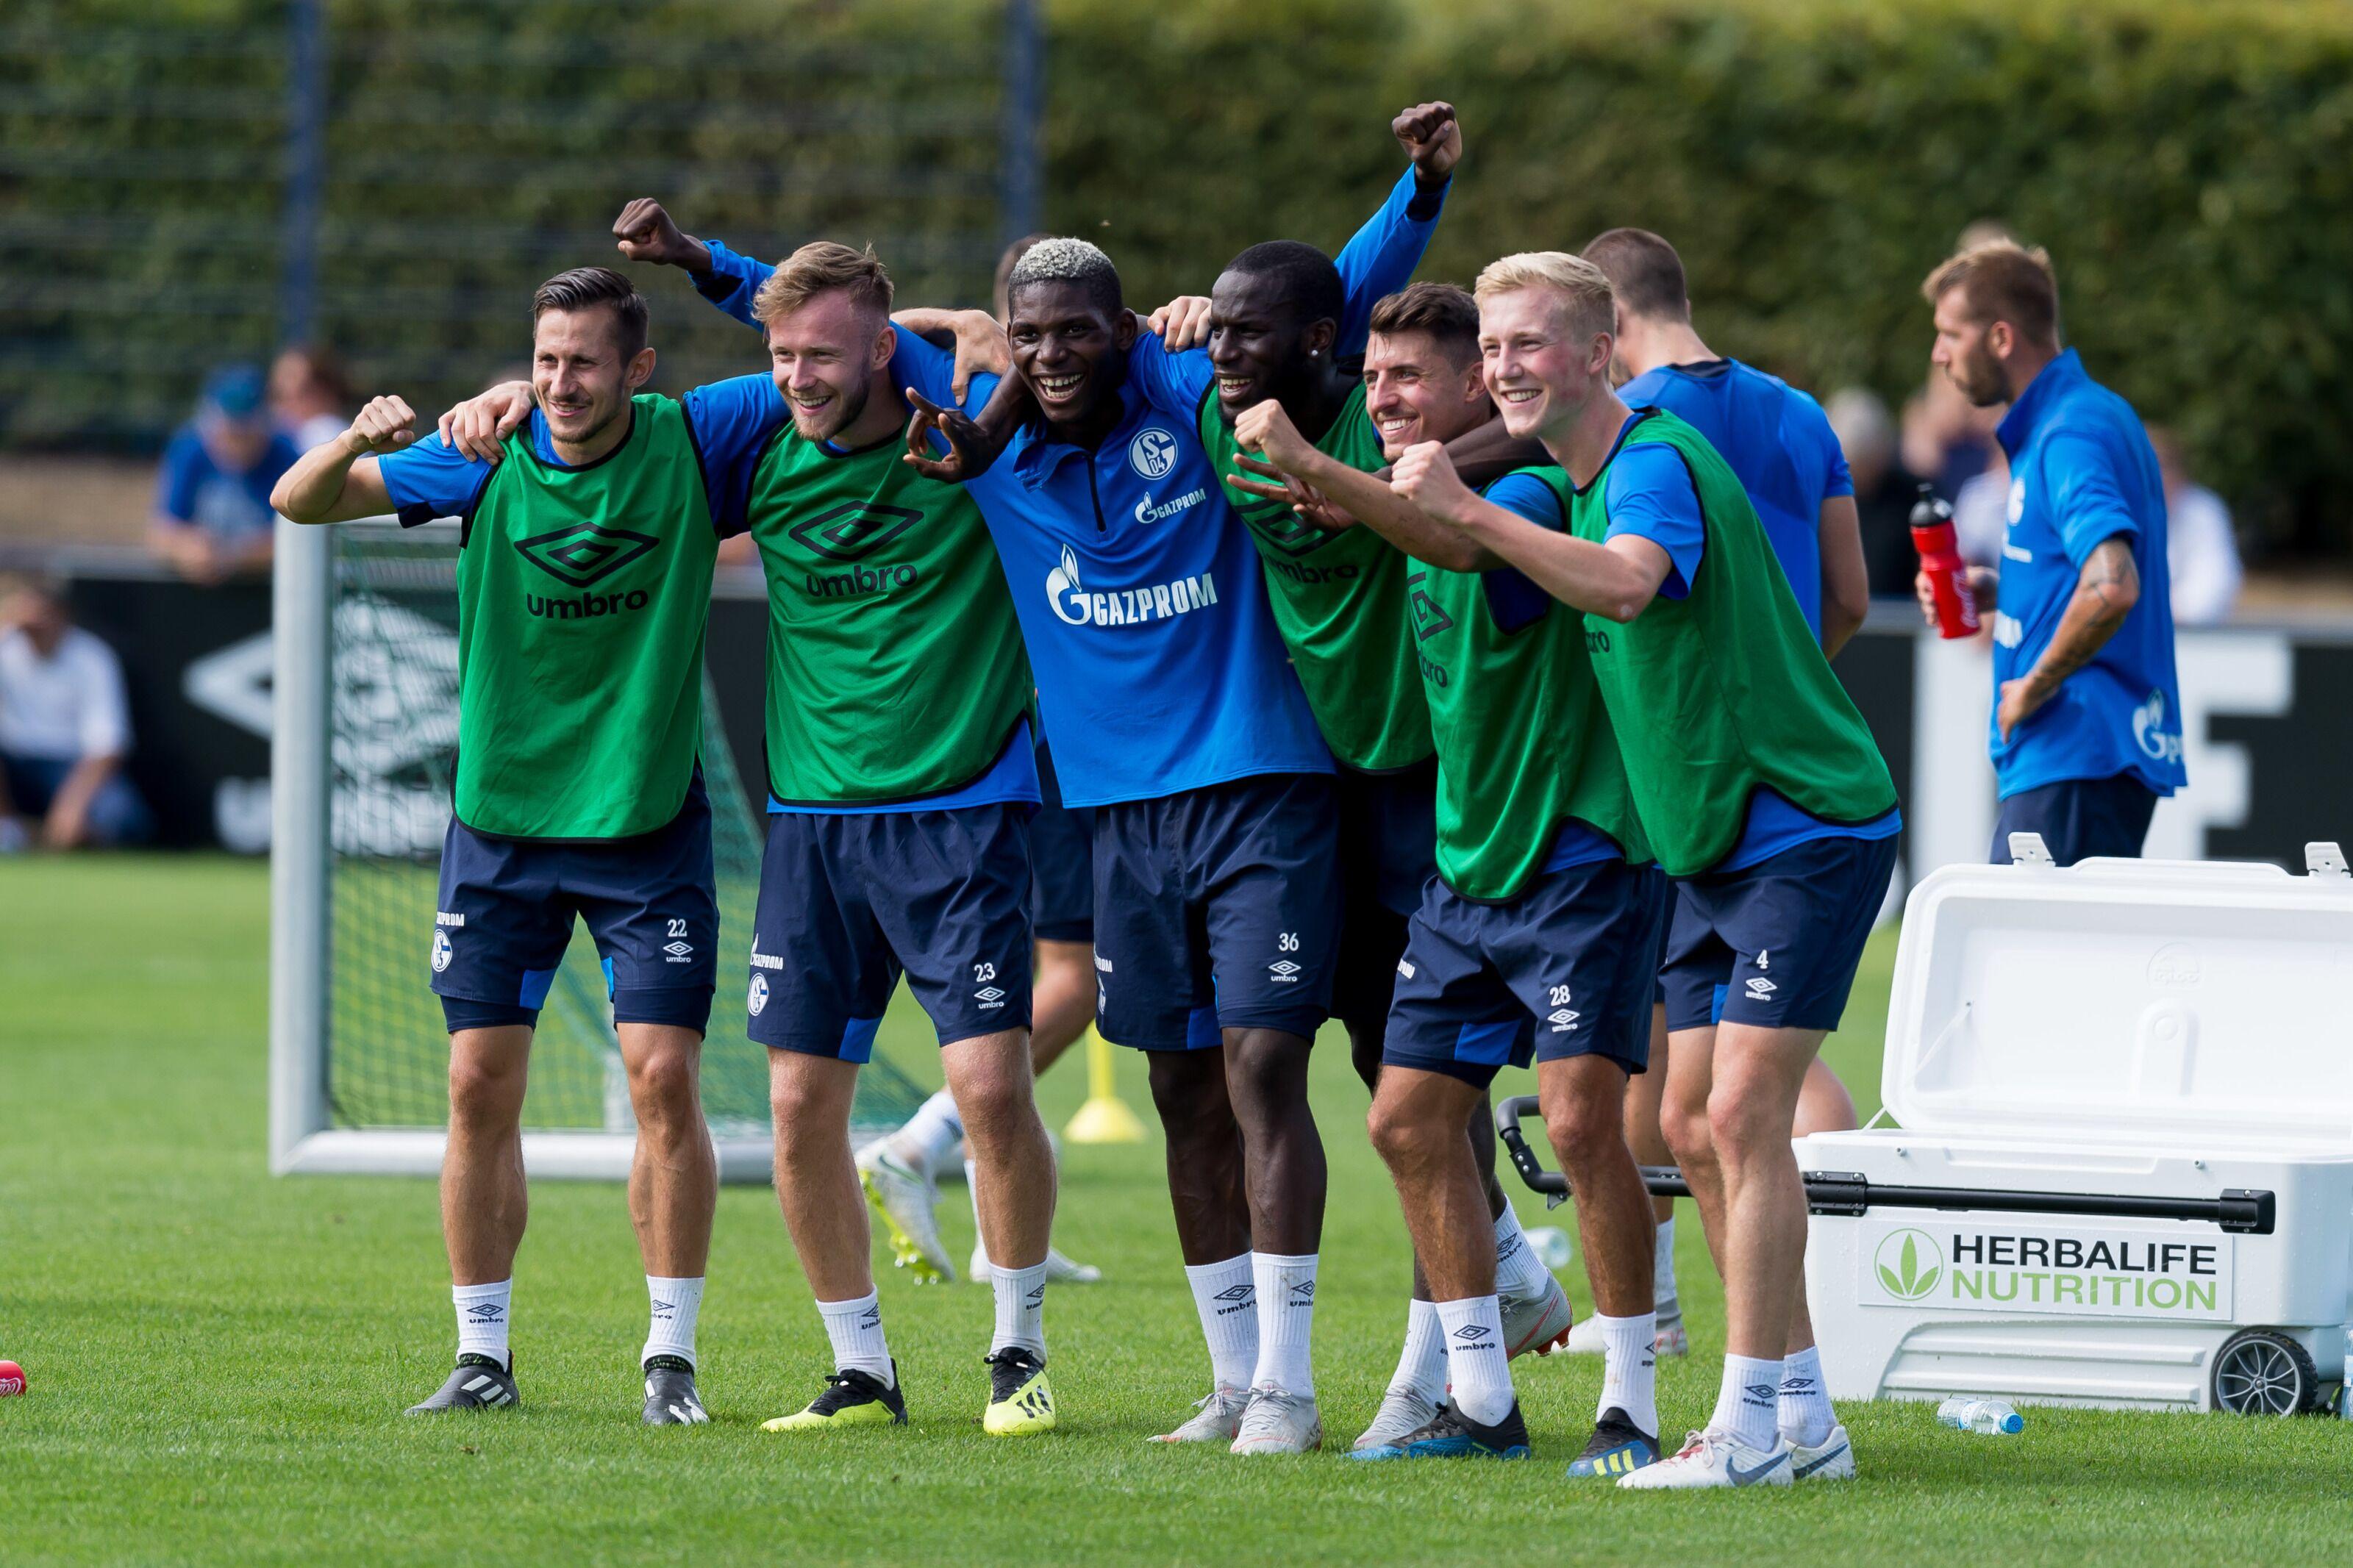 Gelsenkirchen Germany August 21 Steven Skrzybski Of Schalke Cedric Teuchert Of Schalke